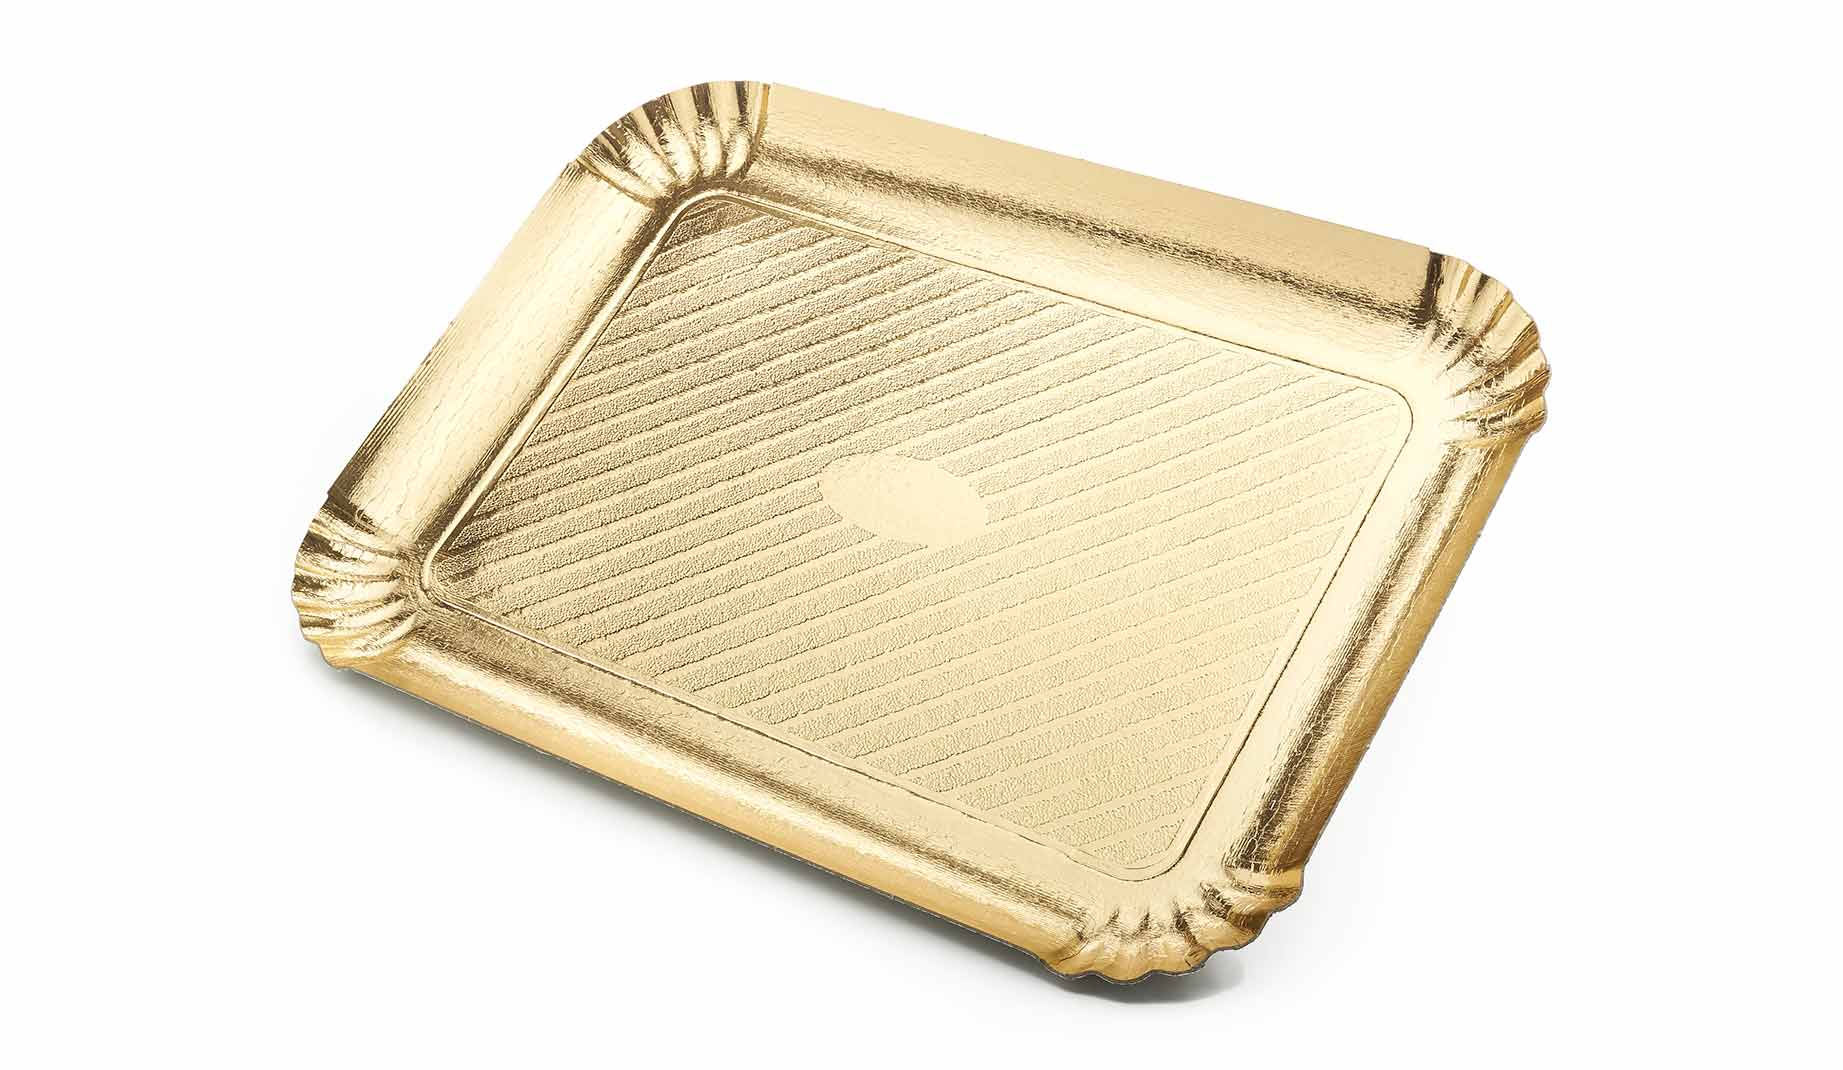 Novacart golden cardboard tray